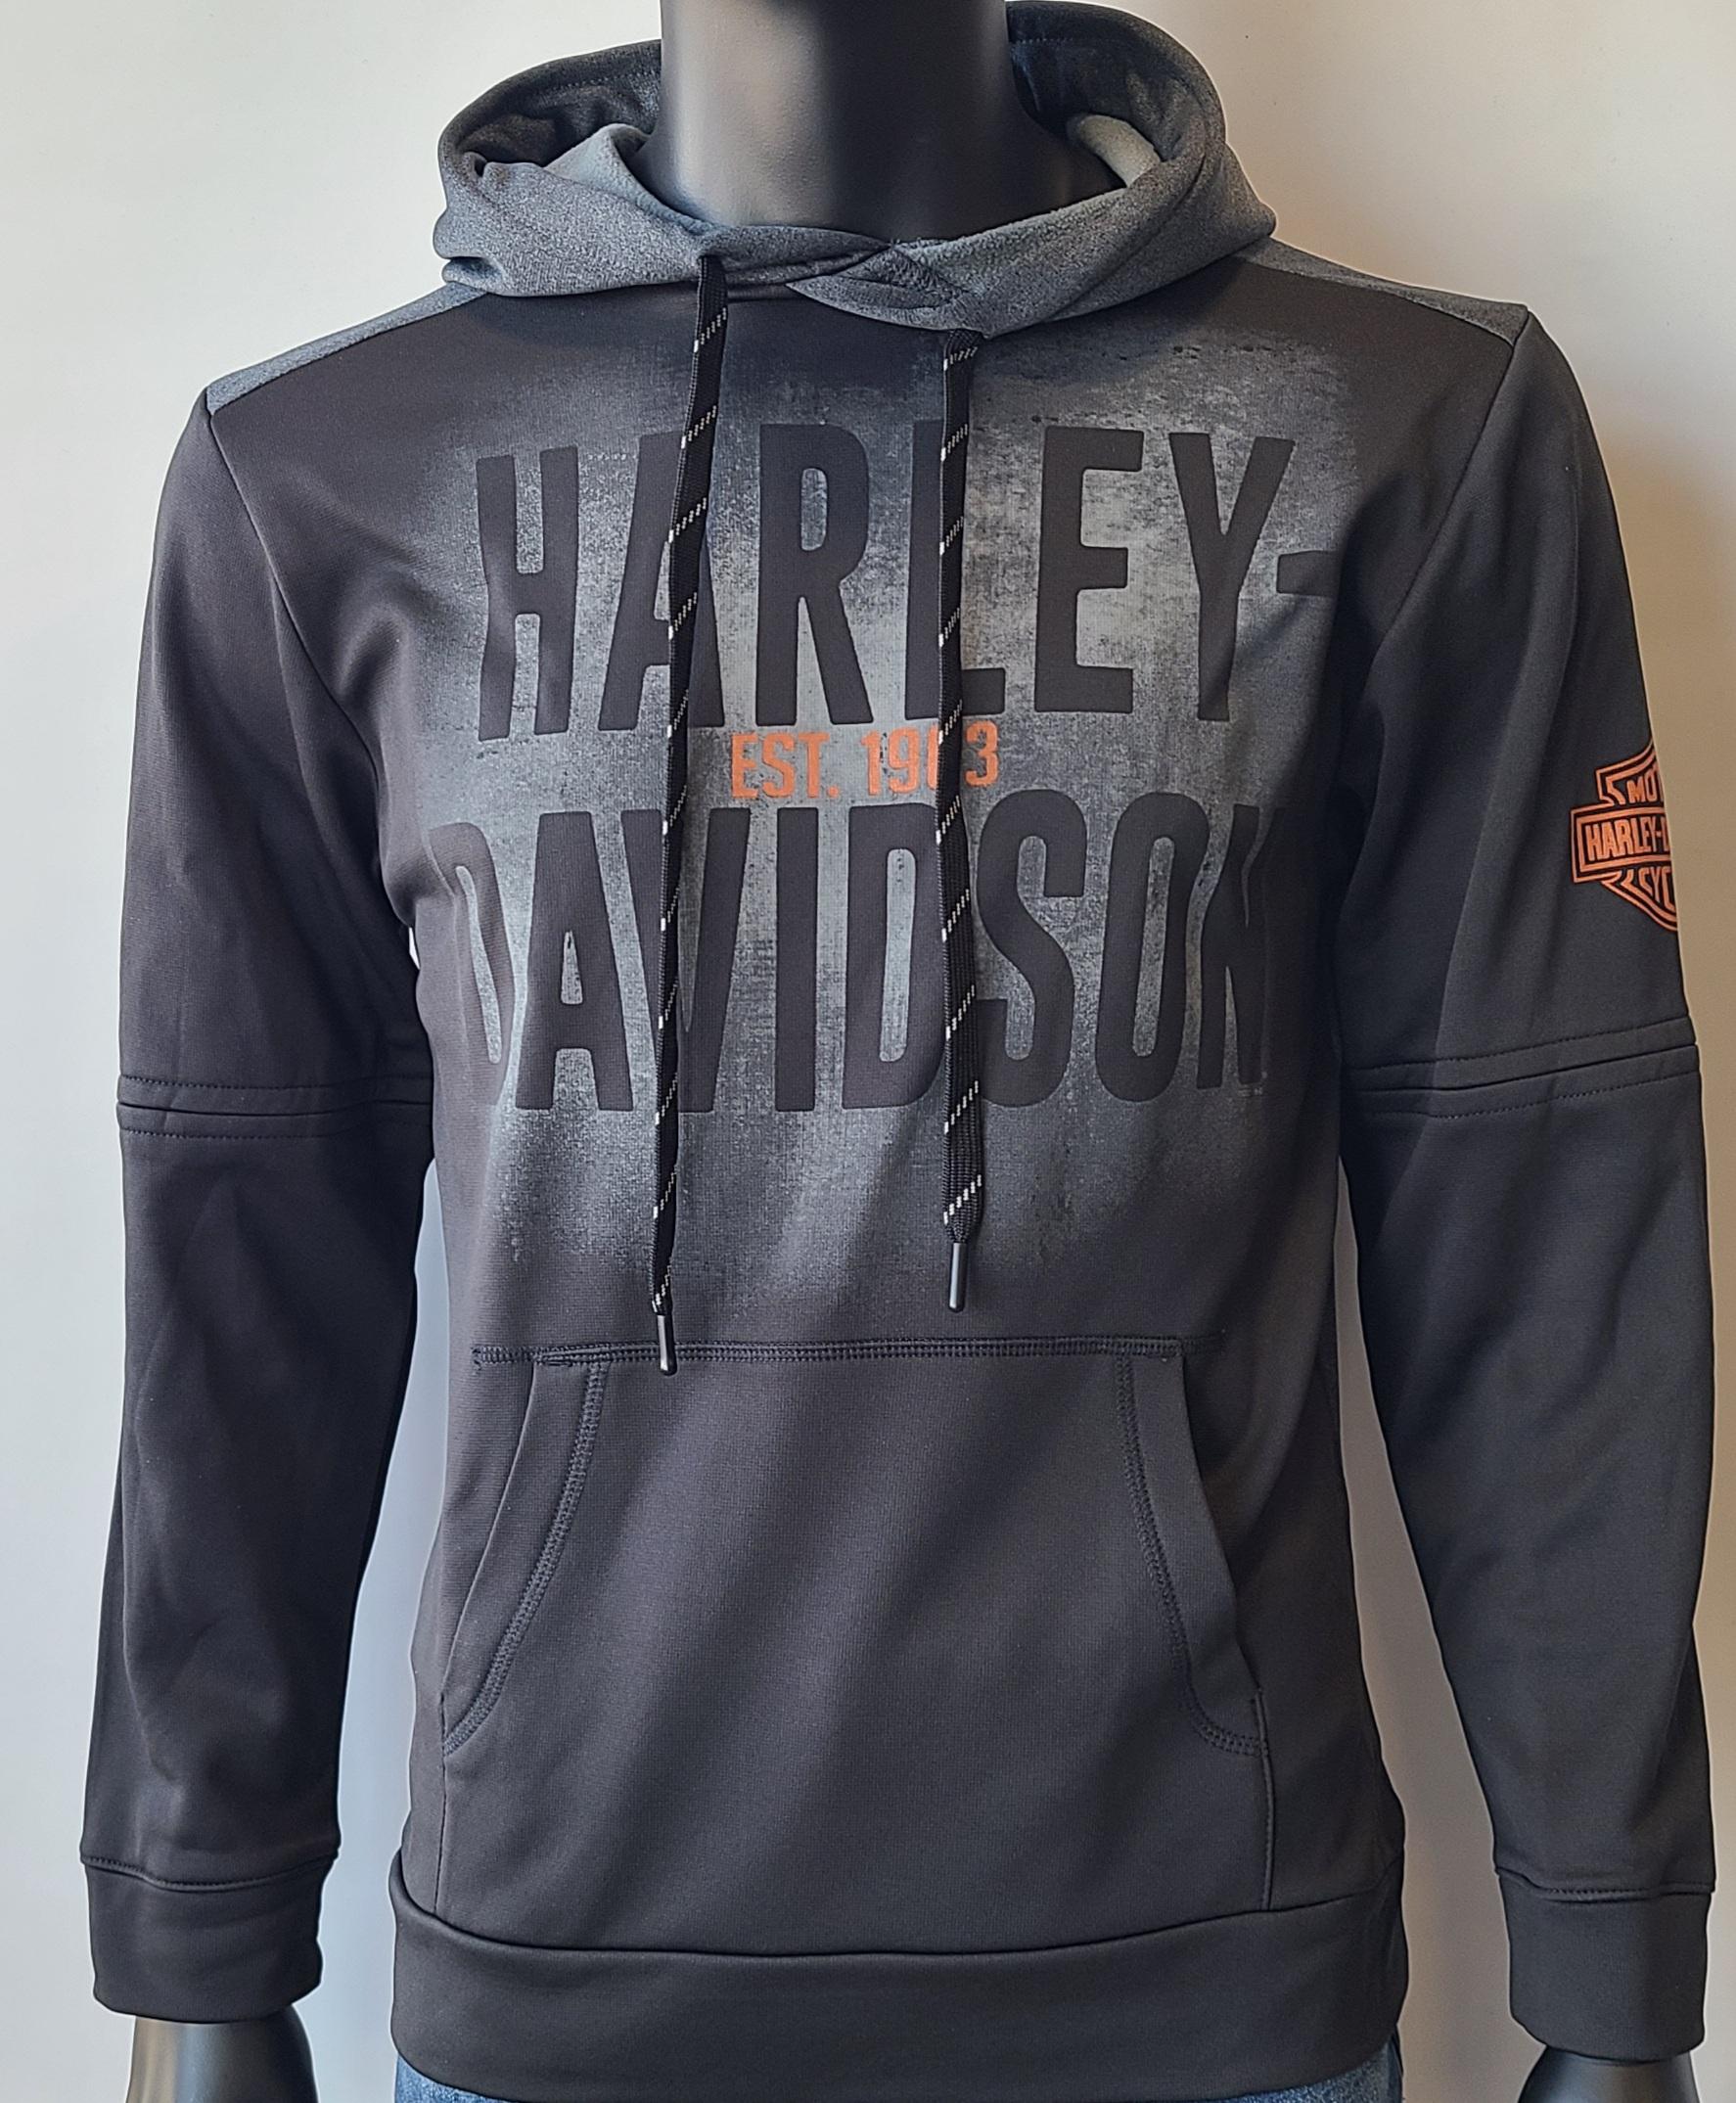 HARLEY DAVIDSON MLB BLK/MLB BK PTCH GY*SERIOUS